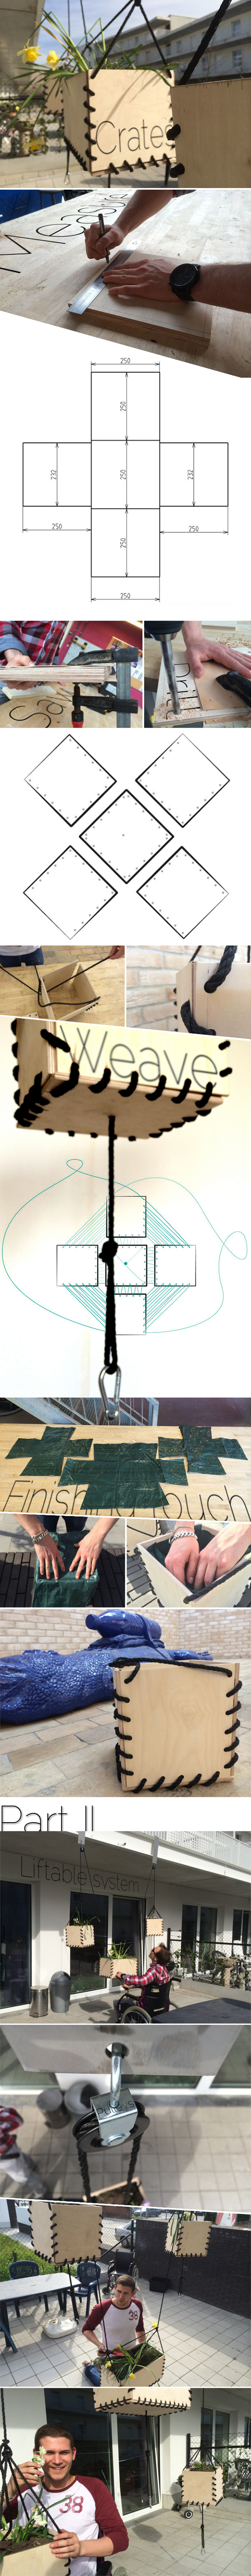 Liftable wheelchair garden planters modular ergonomic gardening hanging